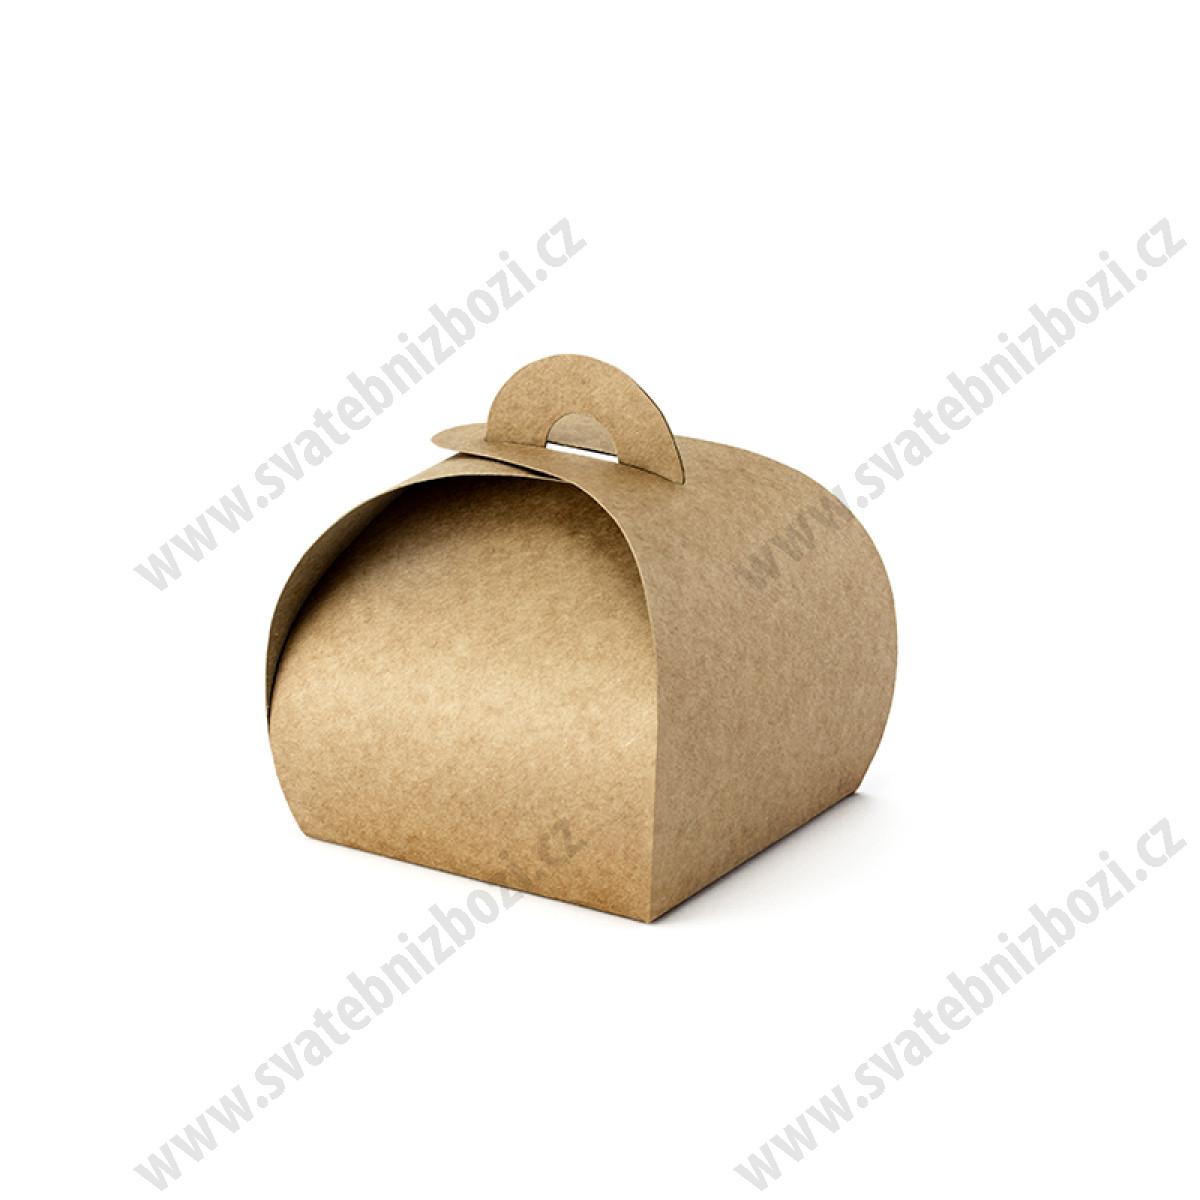 93663e73df Kraftová dárková krabička ( 10 ks   bal ) - Krabičky na dárky - Svatebni  doplňky